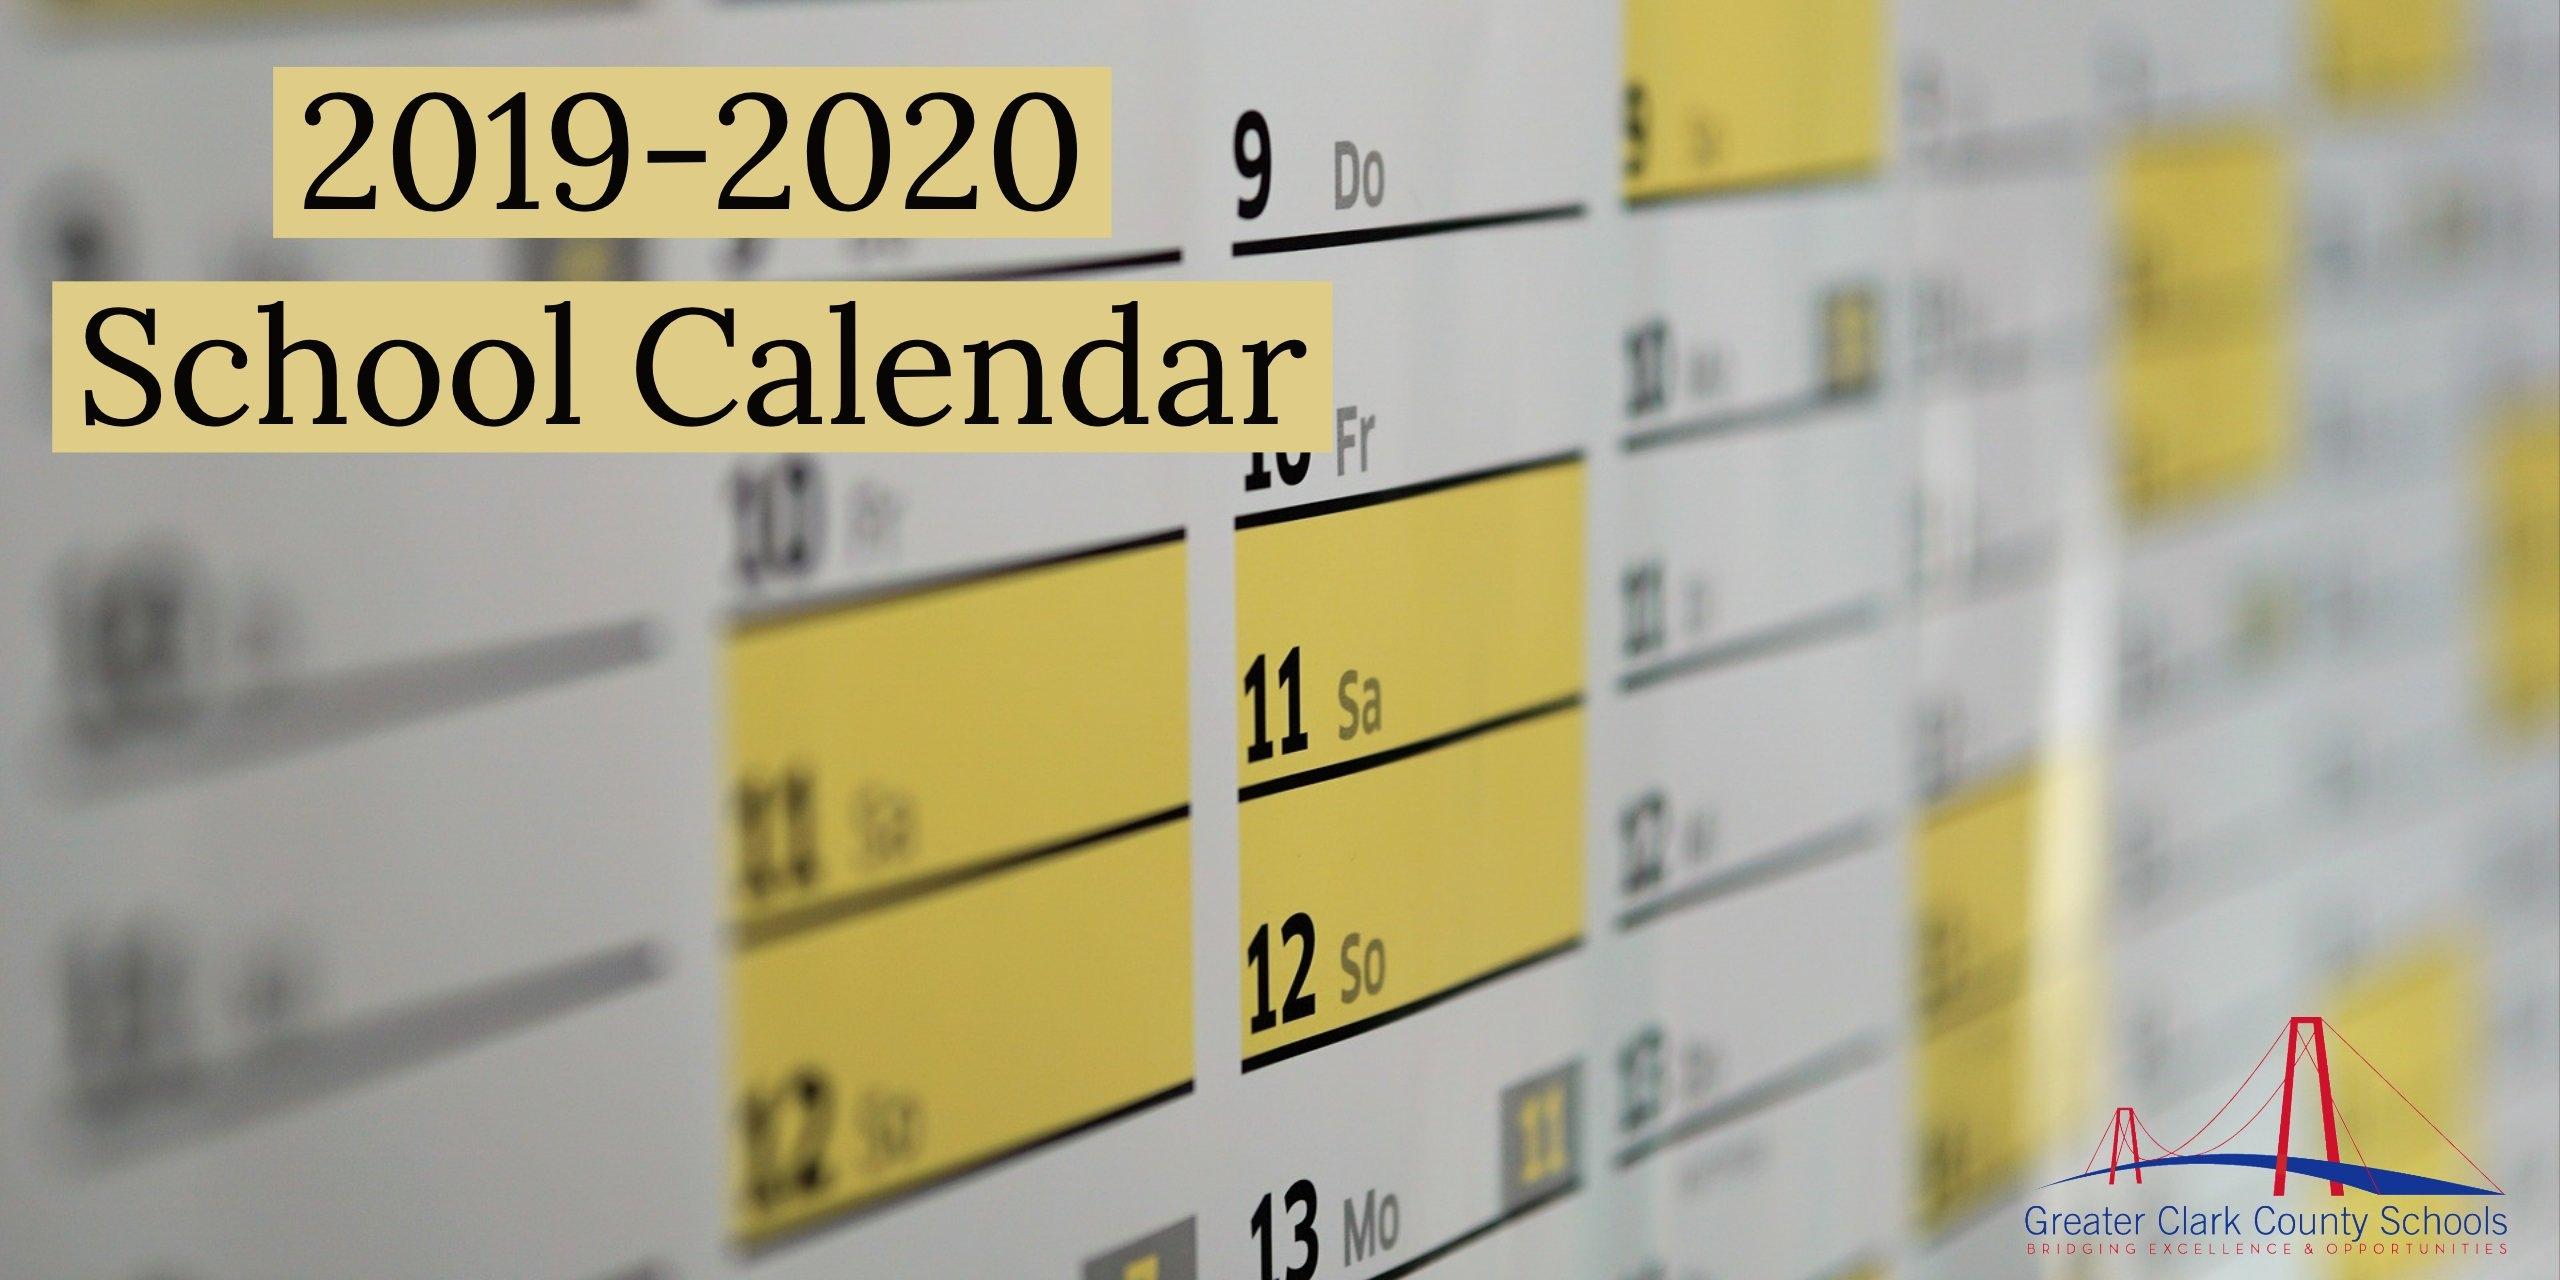 2019 2020 School Calendar – Greater Clark County Schools Ccsd Calendar 2019 20